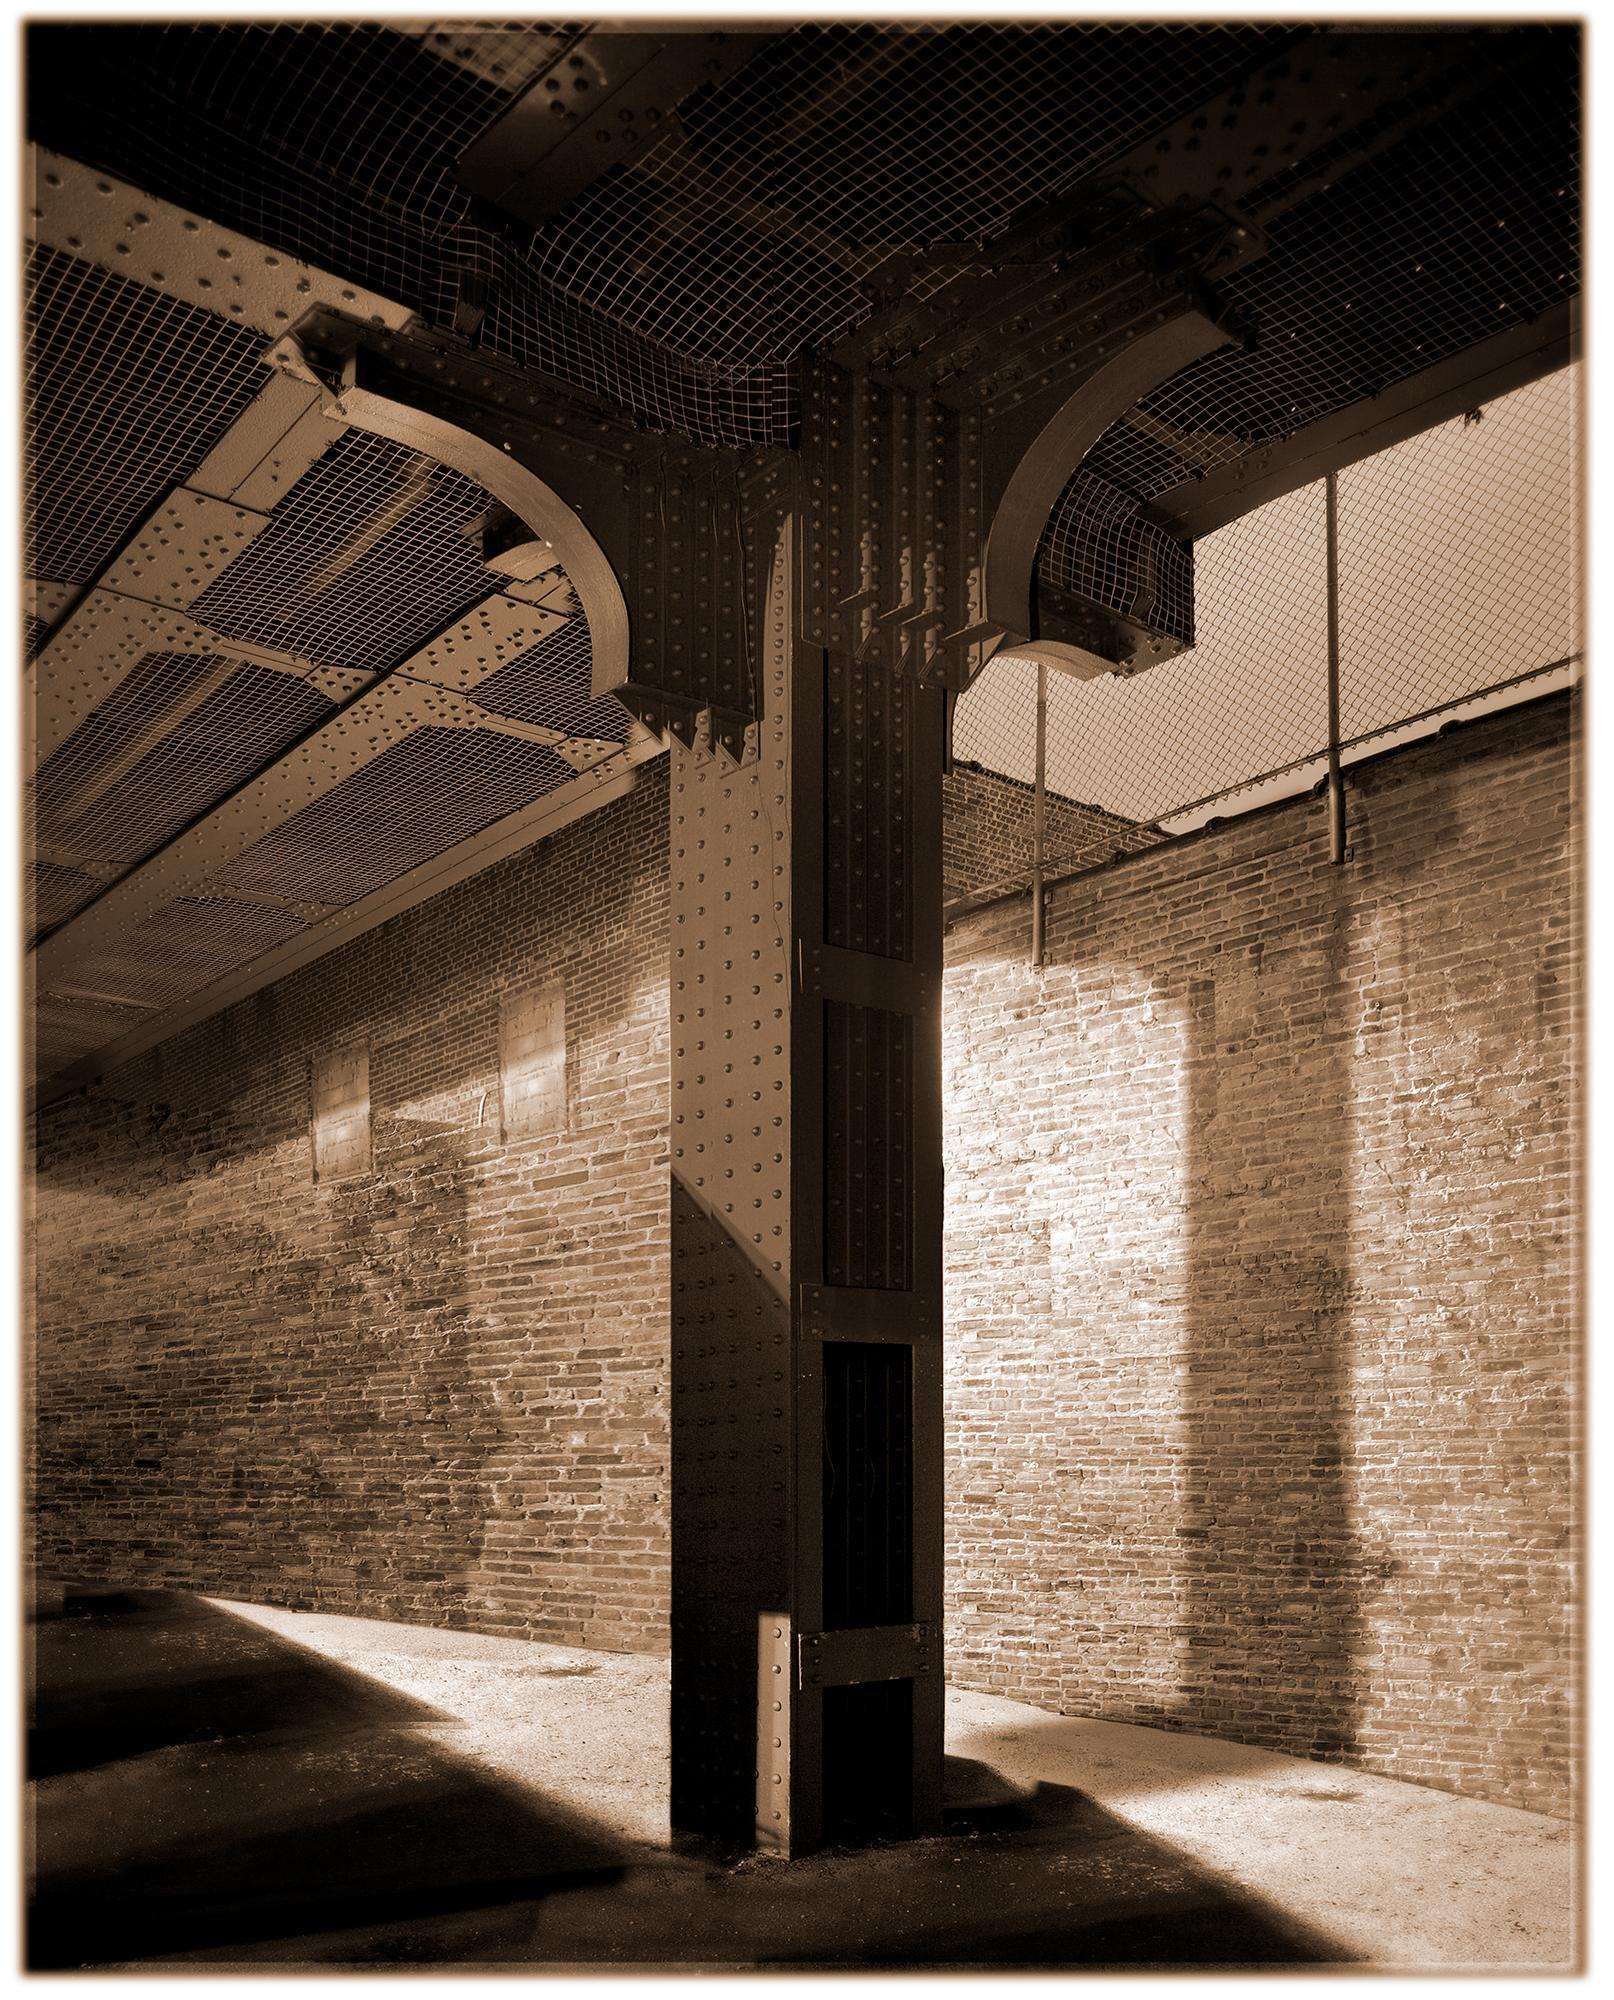 High Line: Column (Sepia Toned Architectural Photograph in Manhattan)